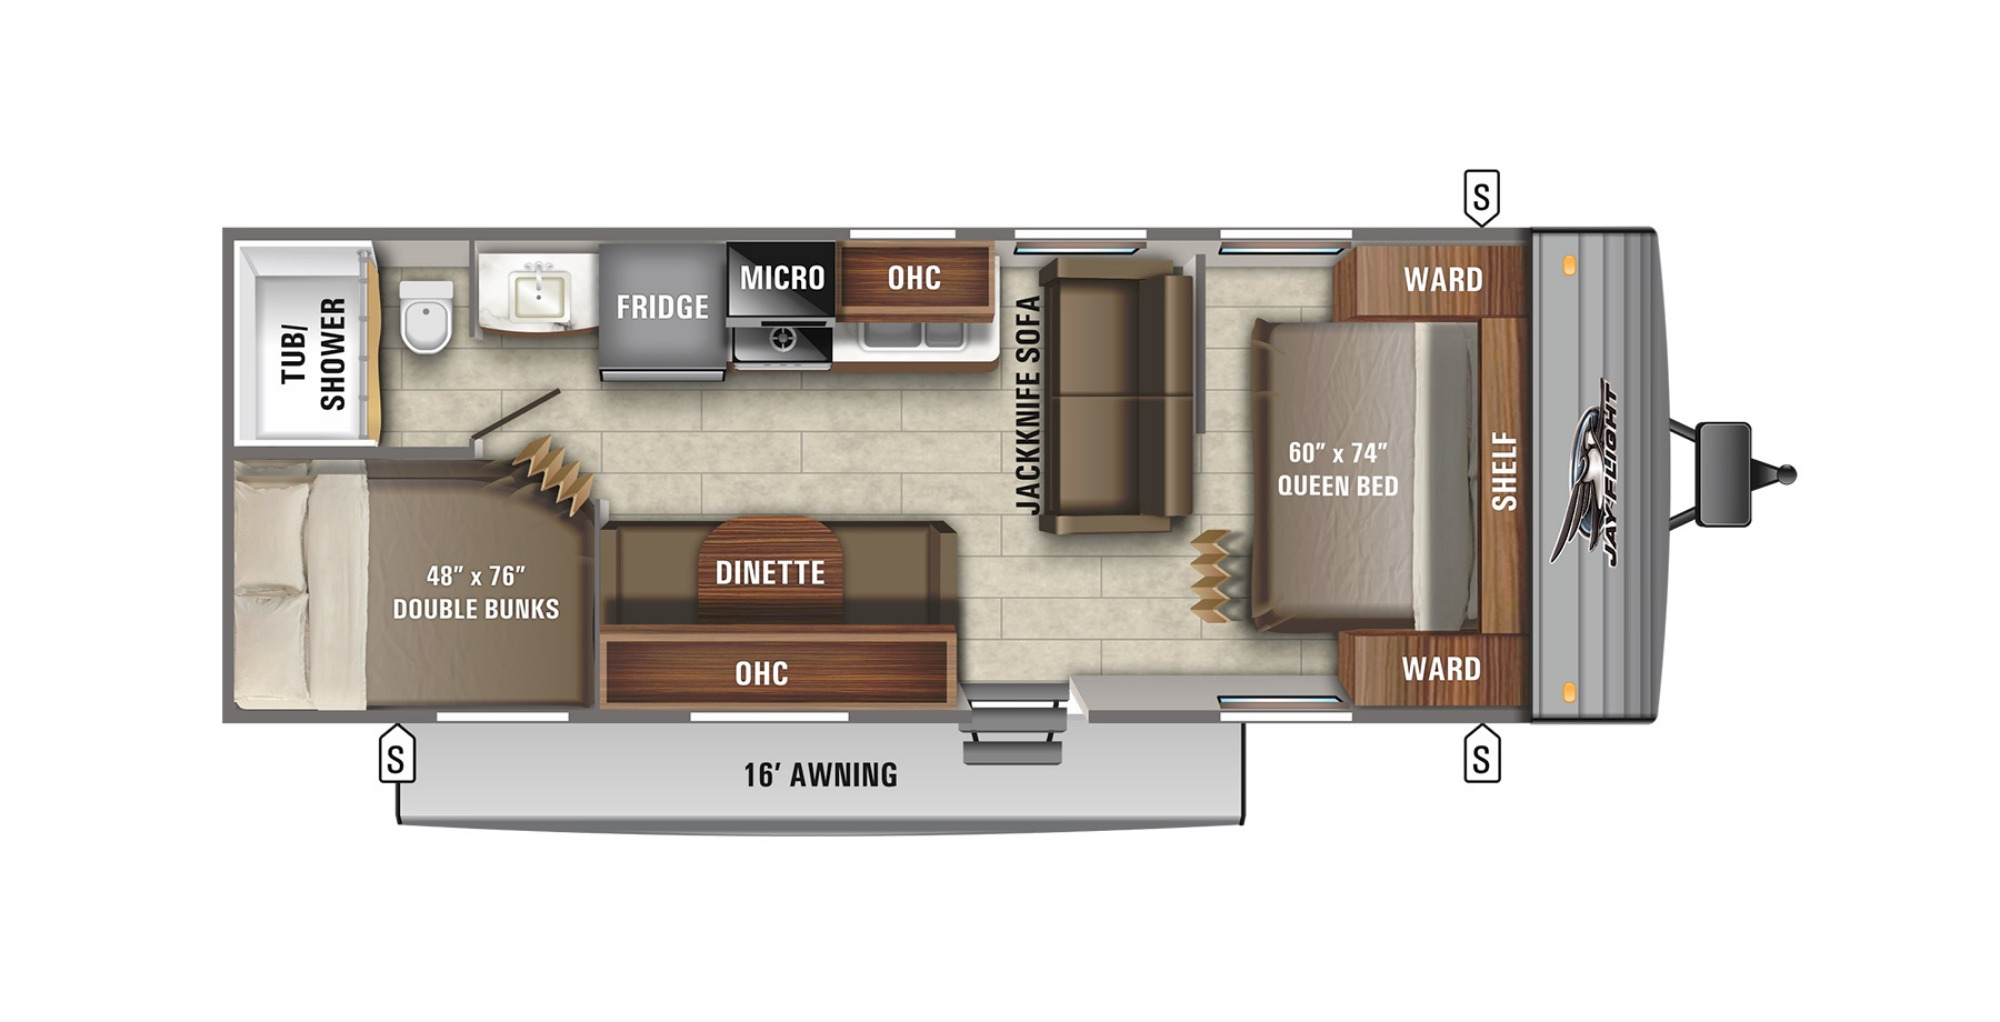 View Floor Plan for 2022 JAYCO JAY FLIGHT SLX 264BH